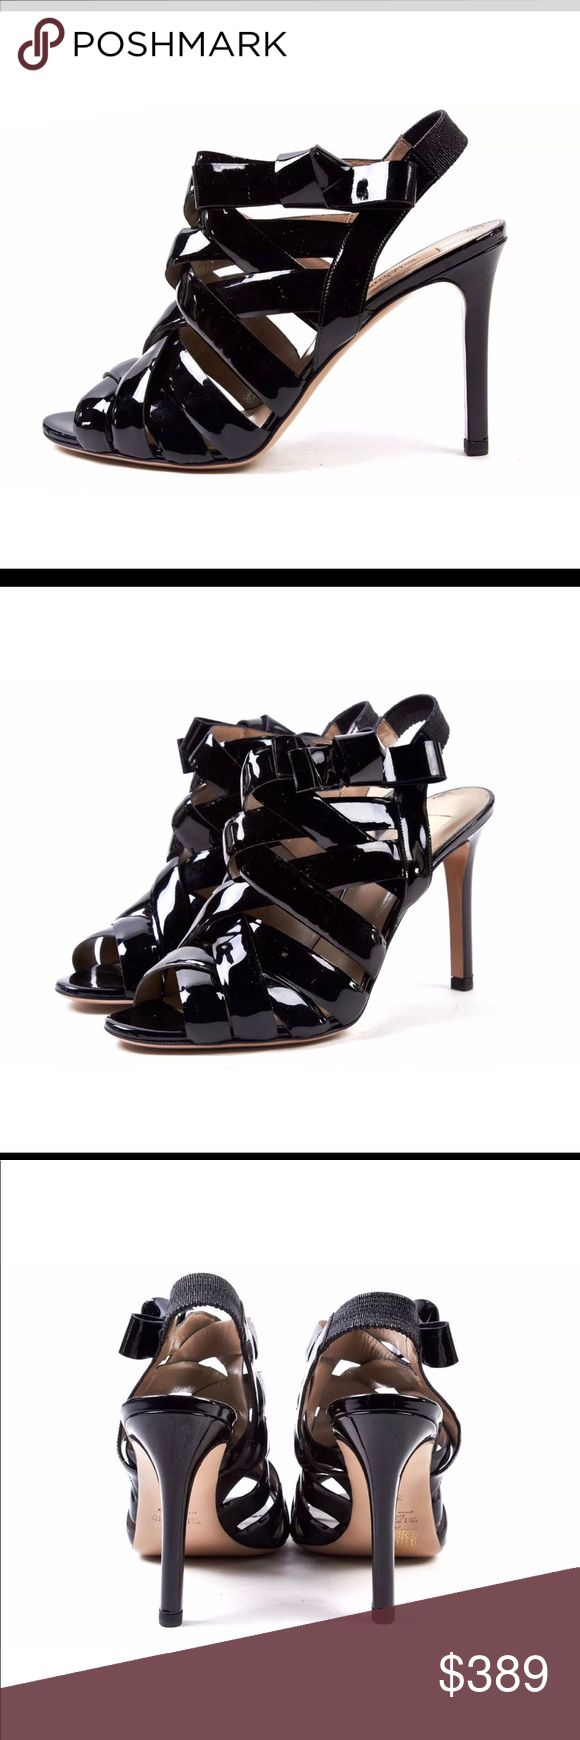 VALENTINO GARAVANI Black Patent High Heels VALENTINO GARAVANI Lido Sandal Roma Valentino Garavani Shoes Heels